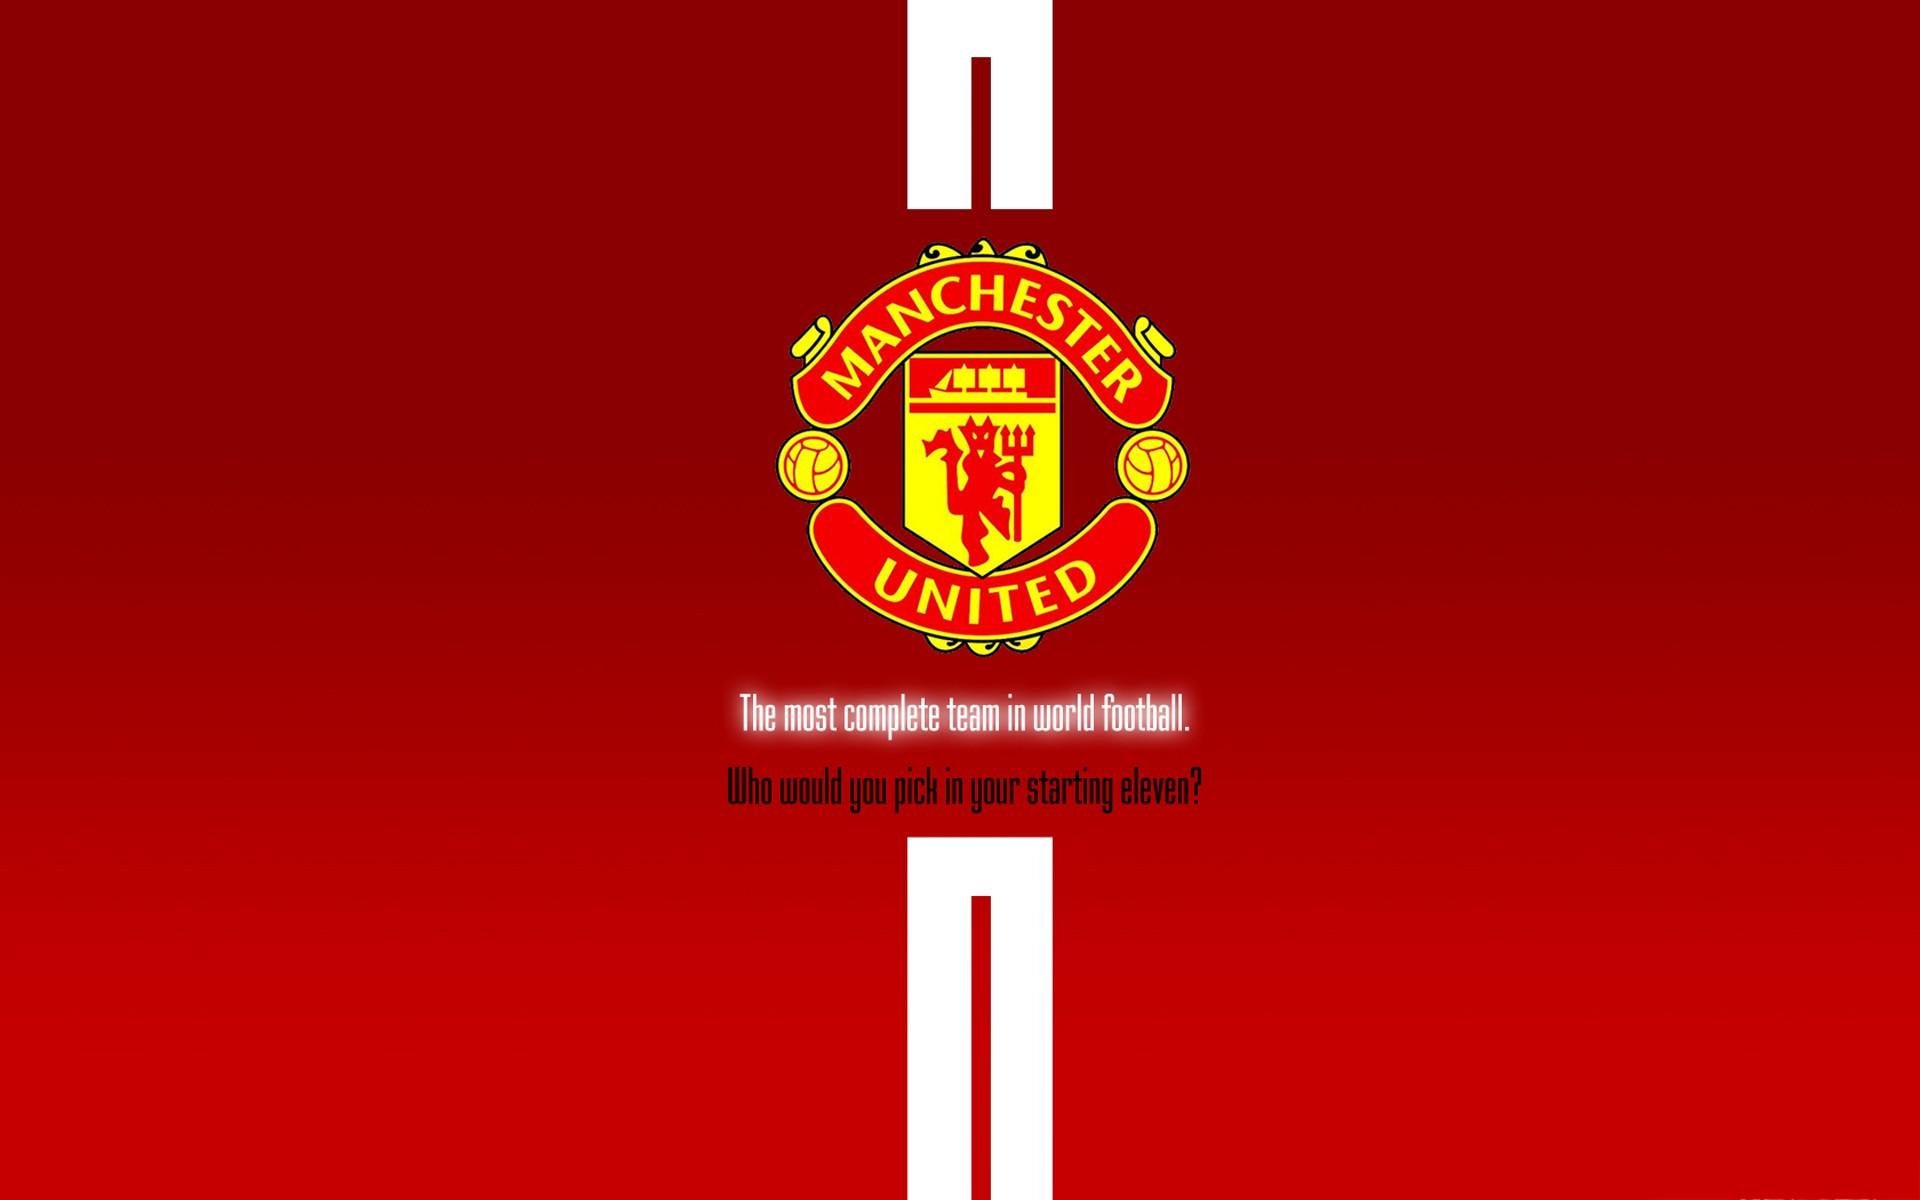 Man Utd Logos Wallpapers Posted By John Cunningham